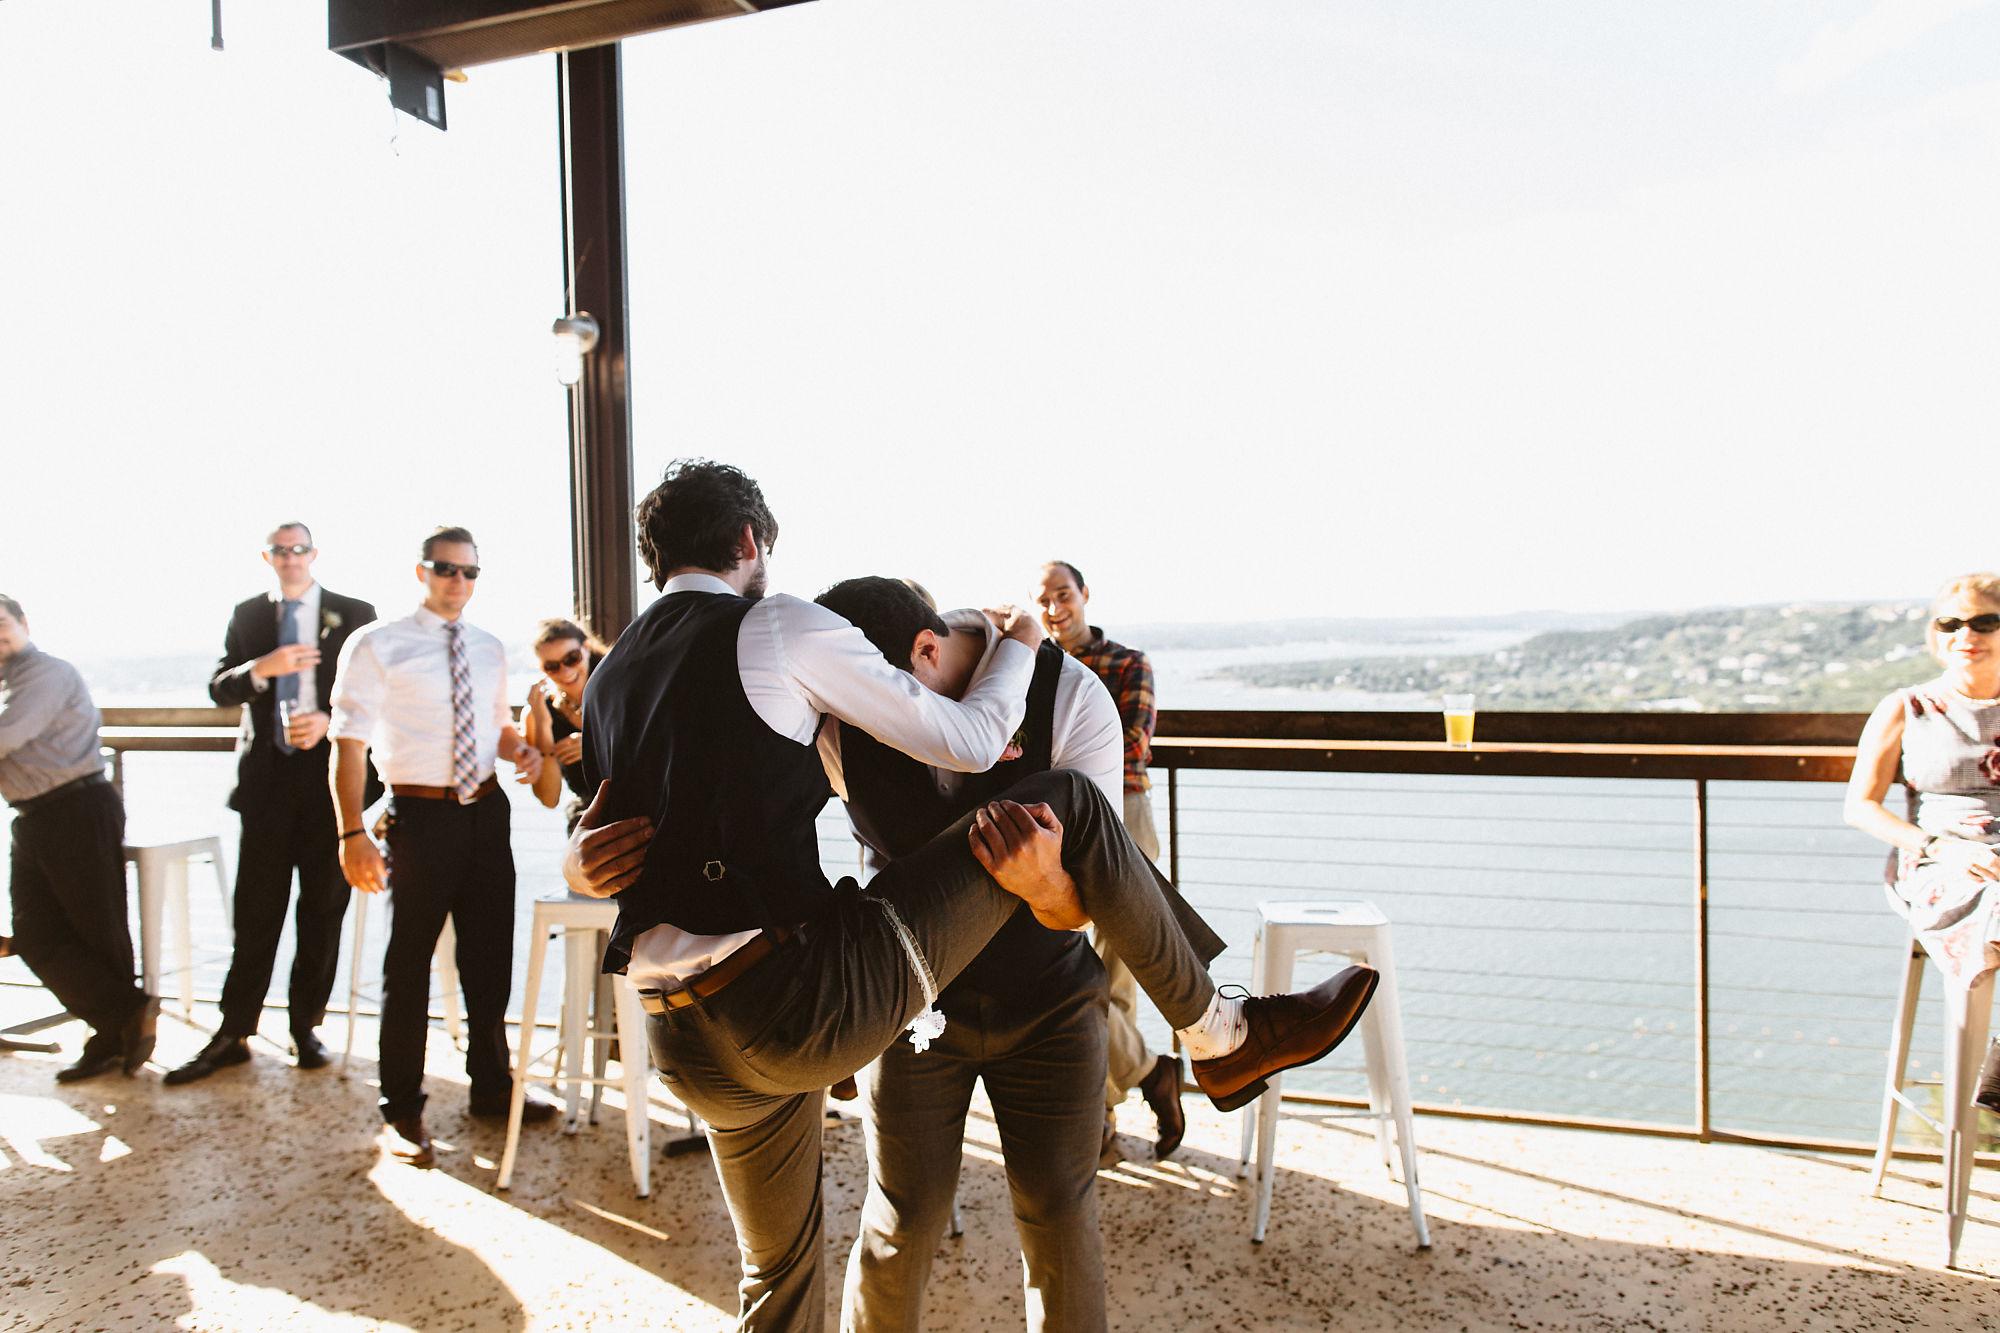 jessica_austin_oasis_brewery_wedding_photos162230.jpg